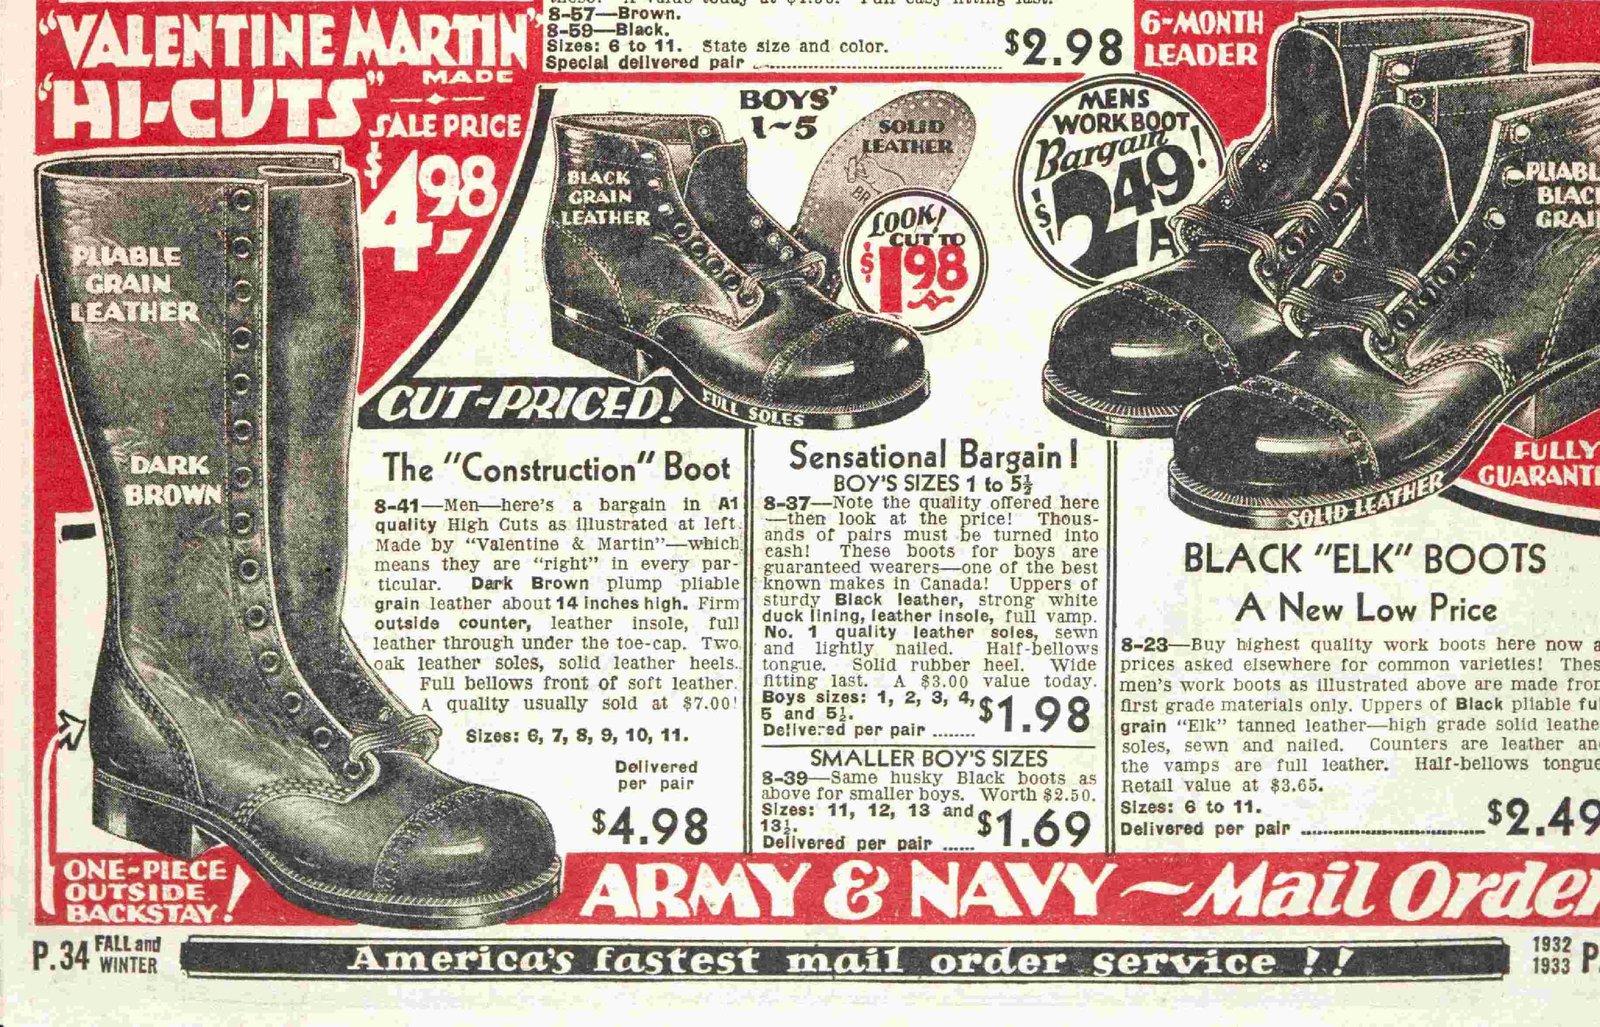 Valentine & Martin 1932-3 Army & Navy 1sm.jpg